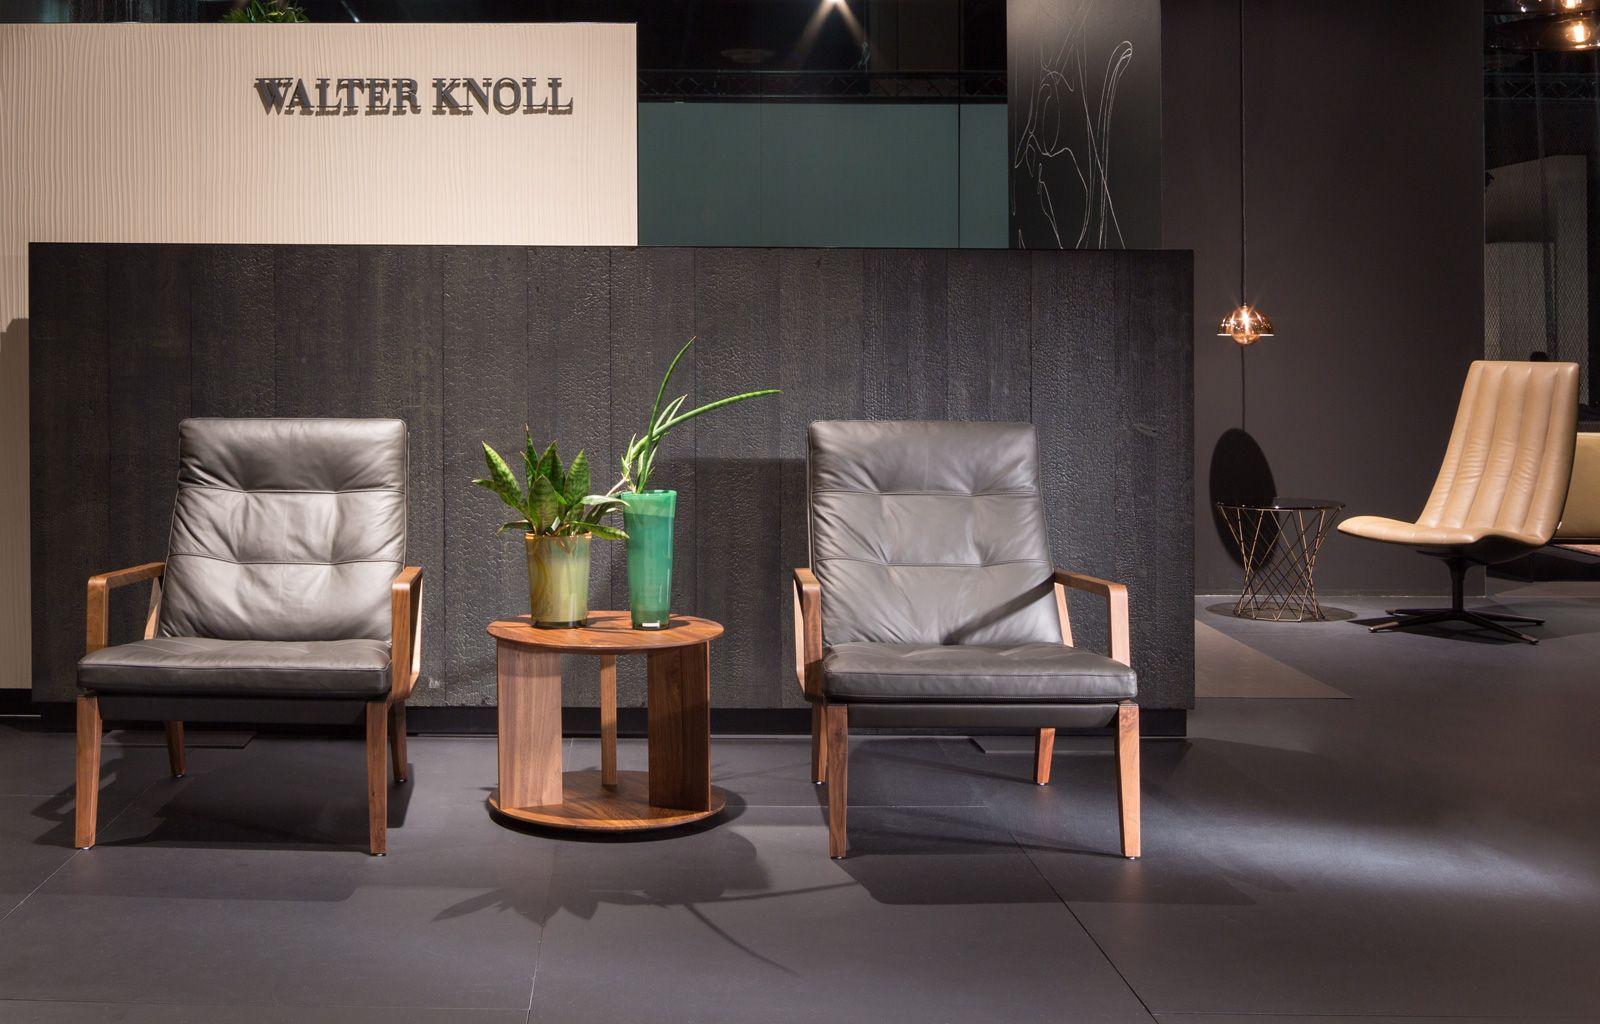 Andoo Lounge   Walter Knoll   Elegant   Pinterest   Complex art ...